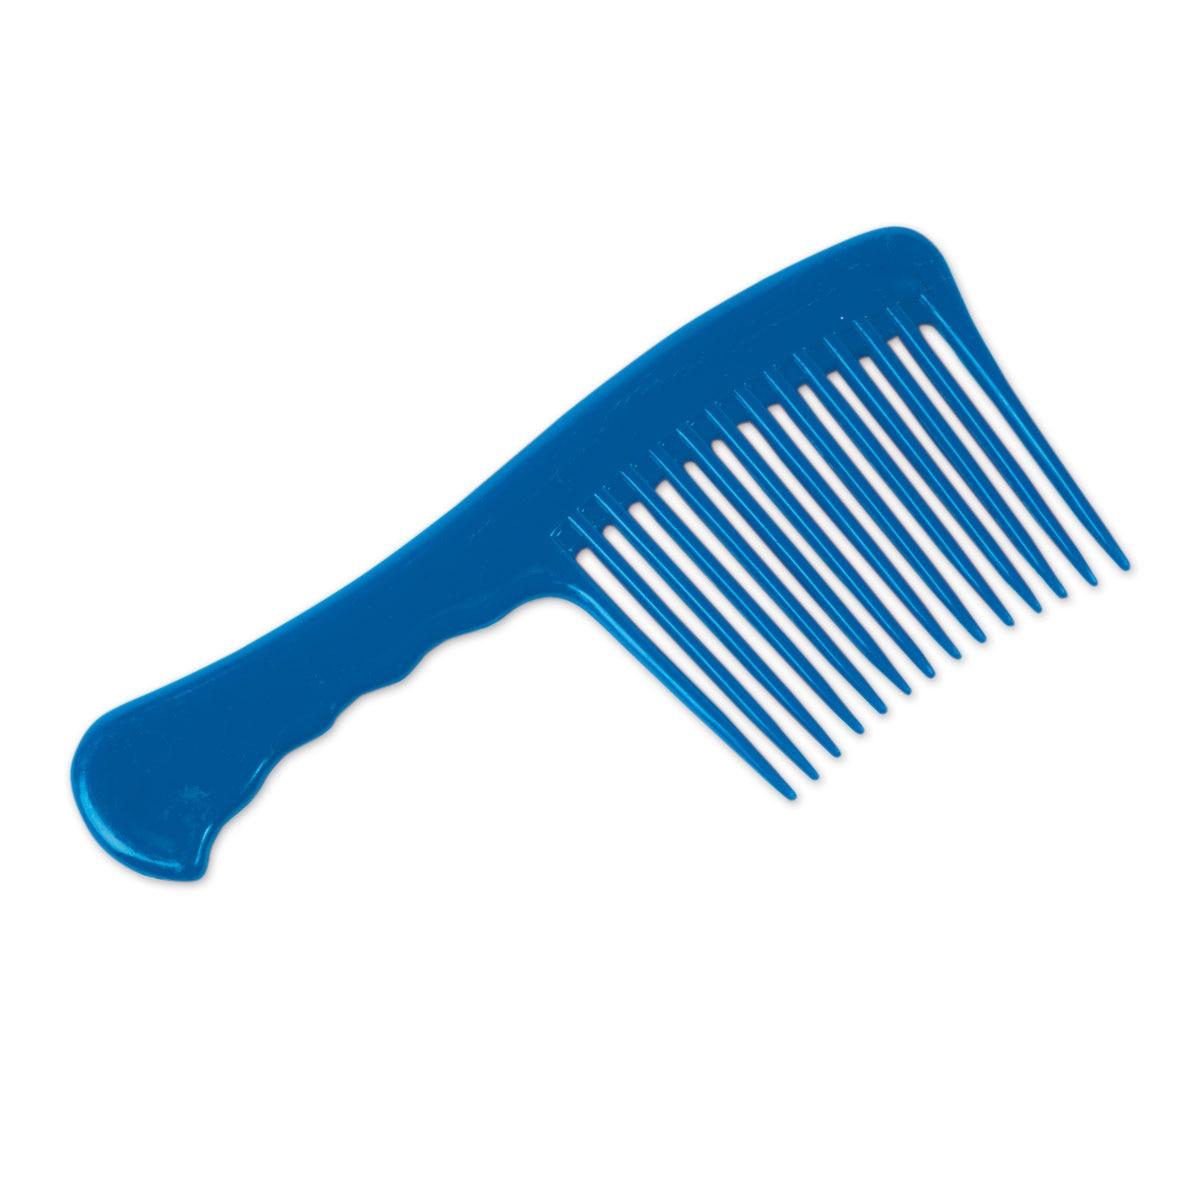 Mane & Tail Comb